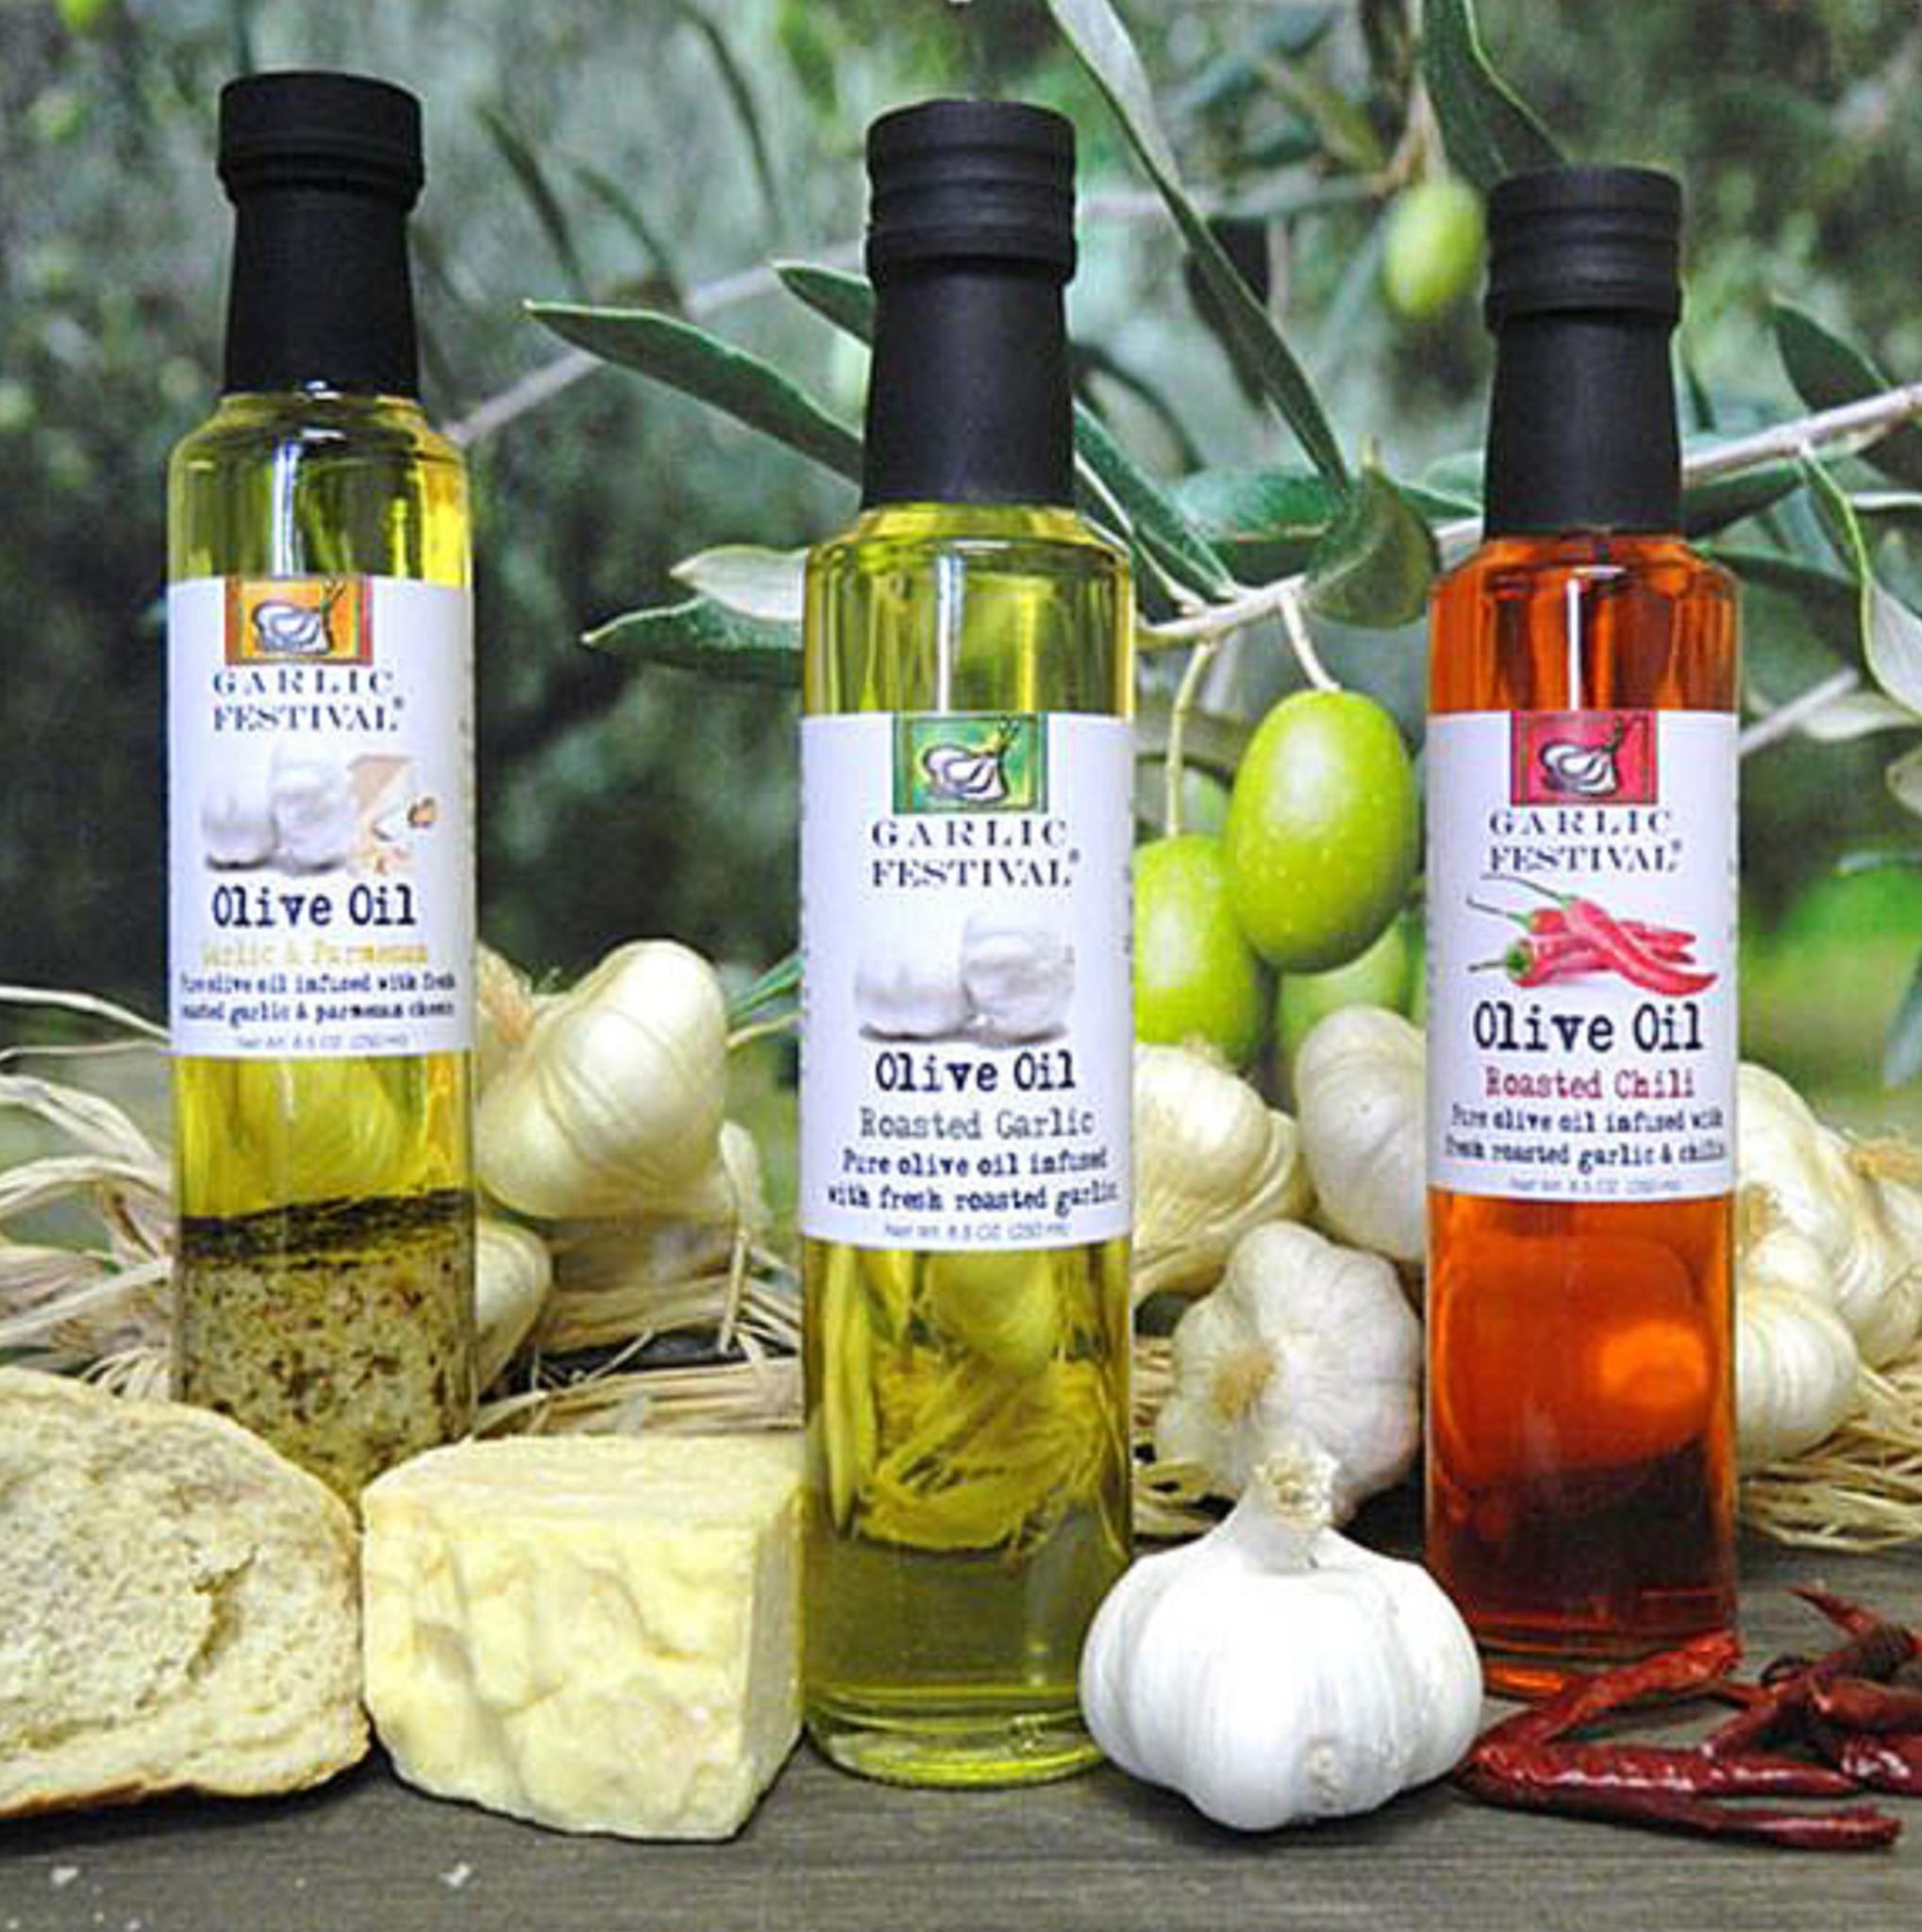 Garlic Festival Foods Garlic Olive Oils & Vinegars